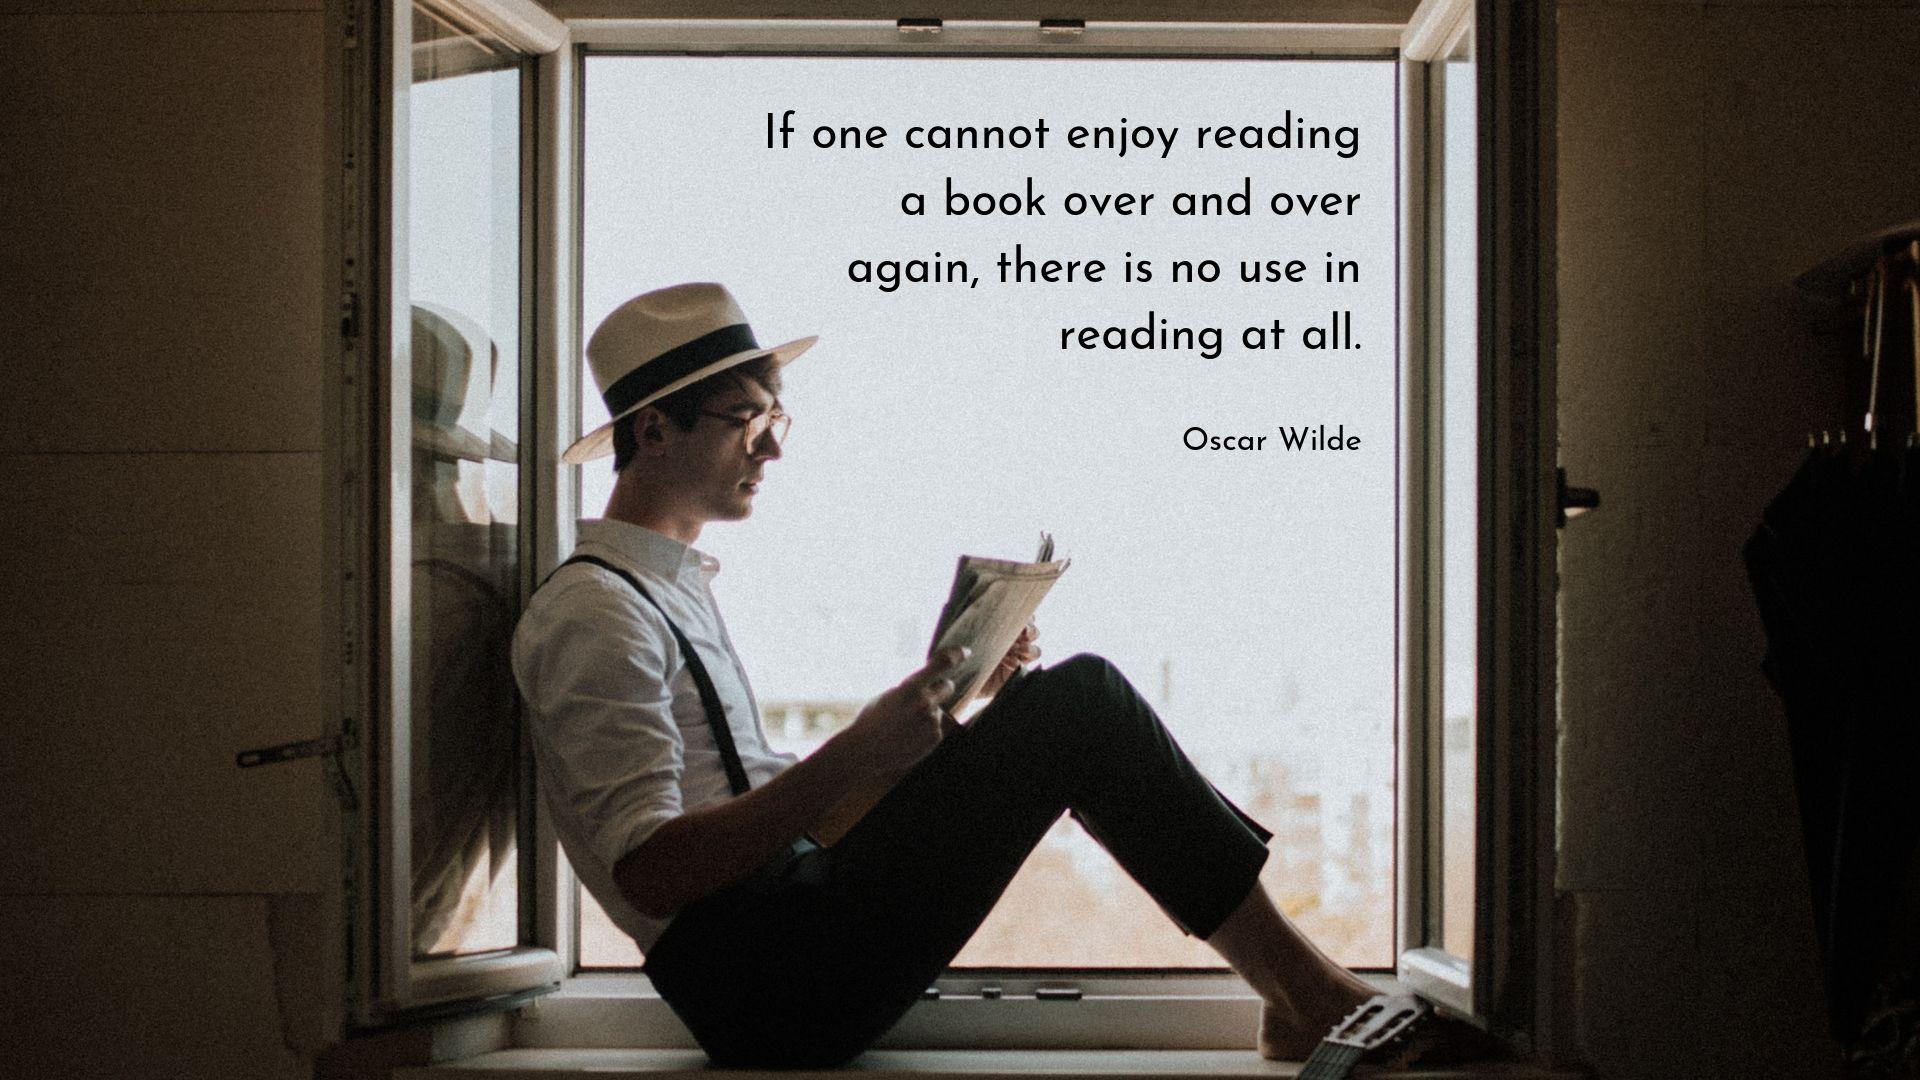 banner-lines-to-love-we-love-reading-books-03.jpg